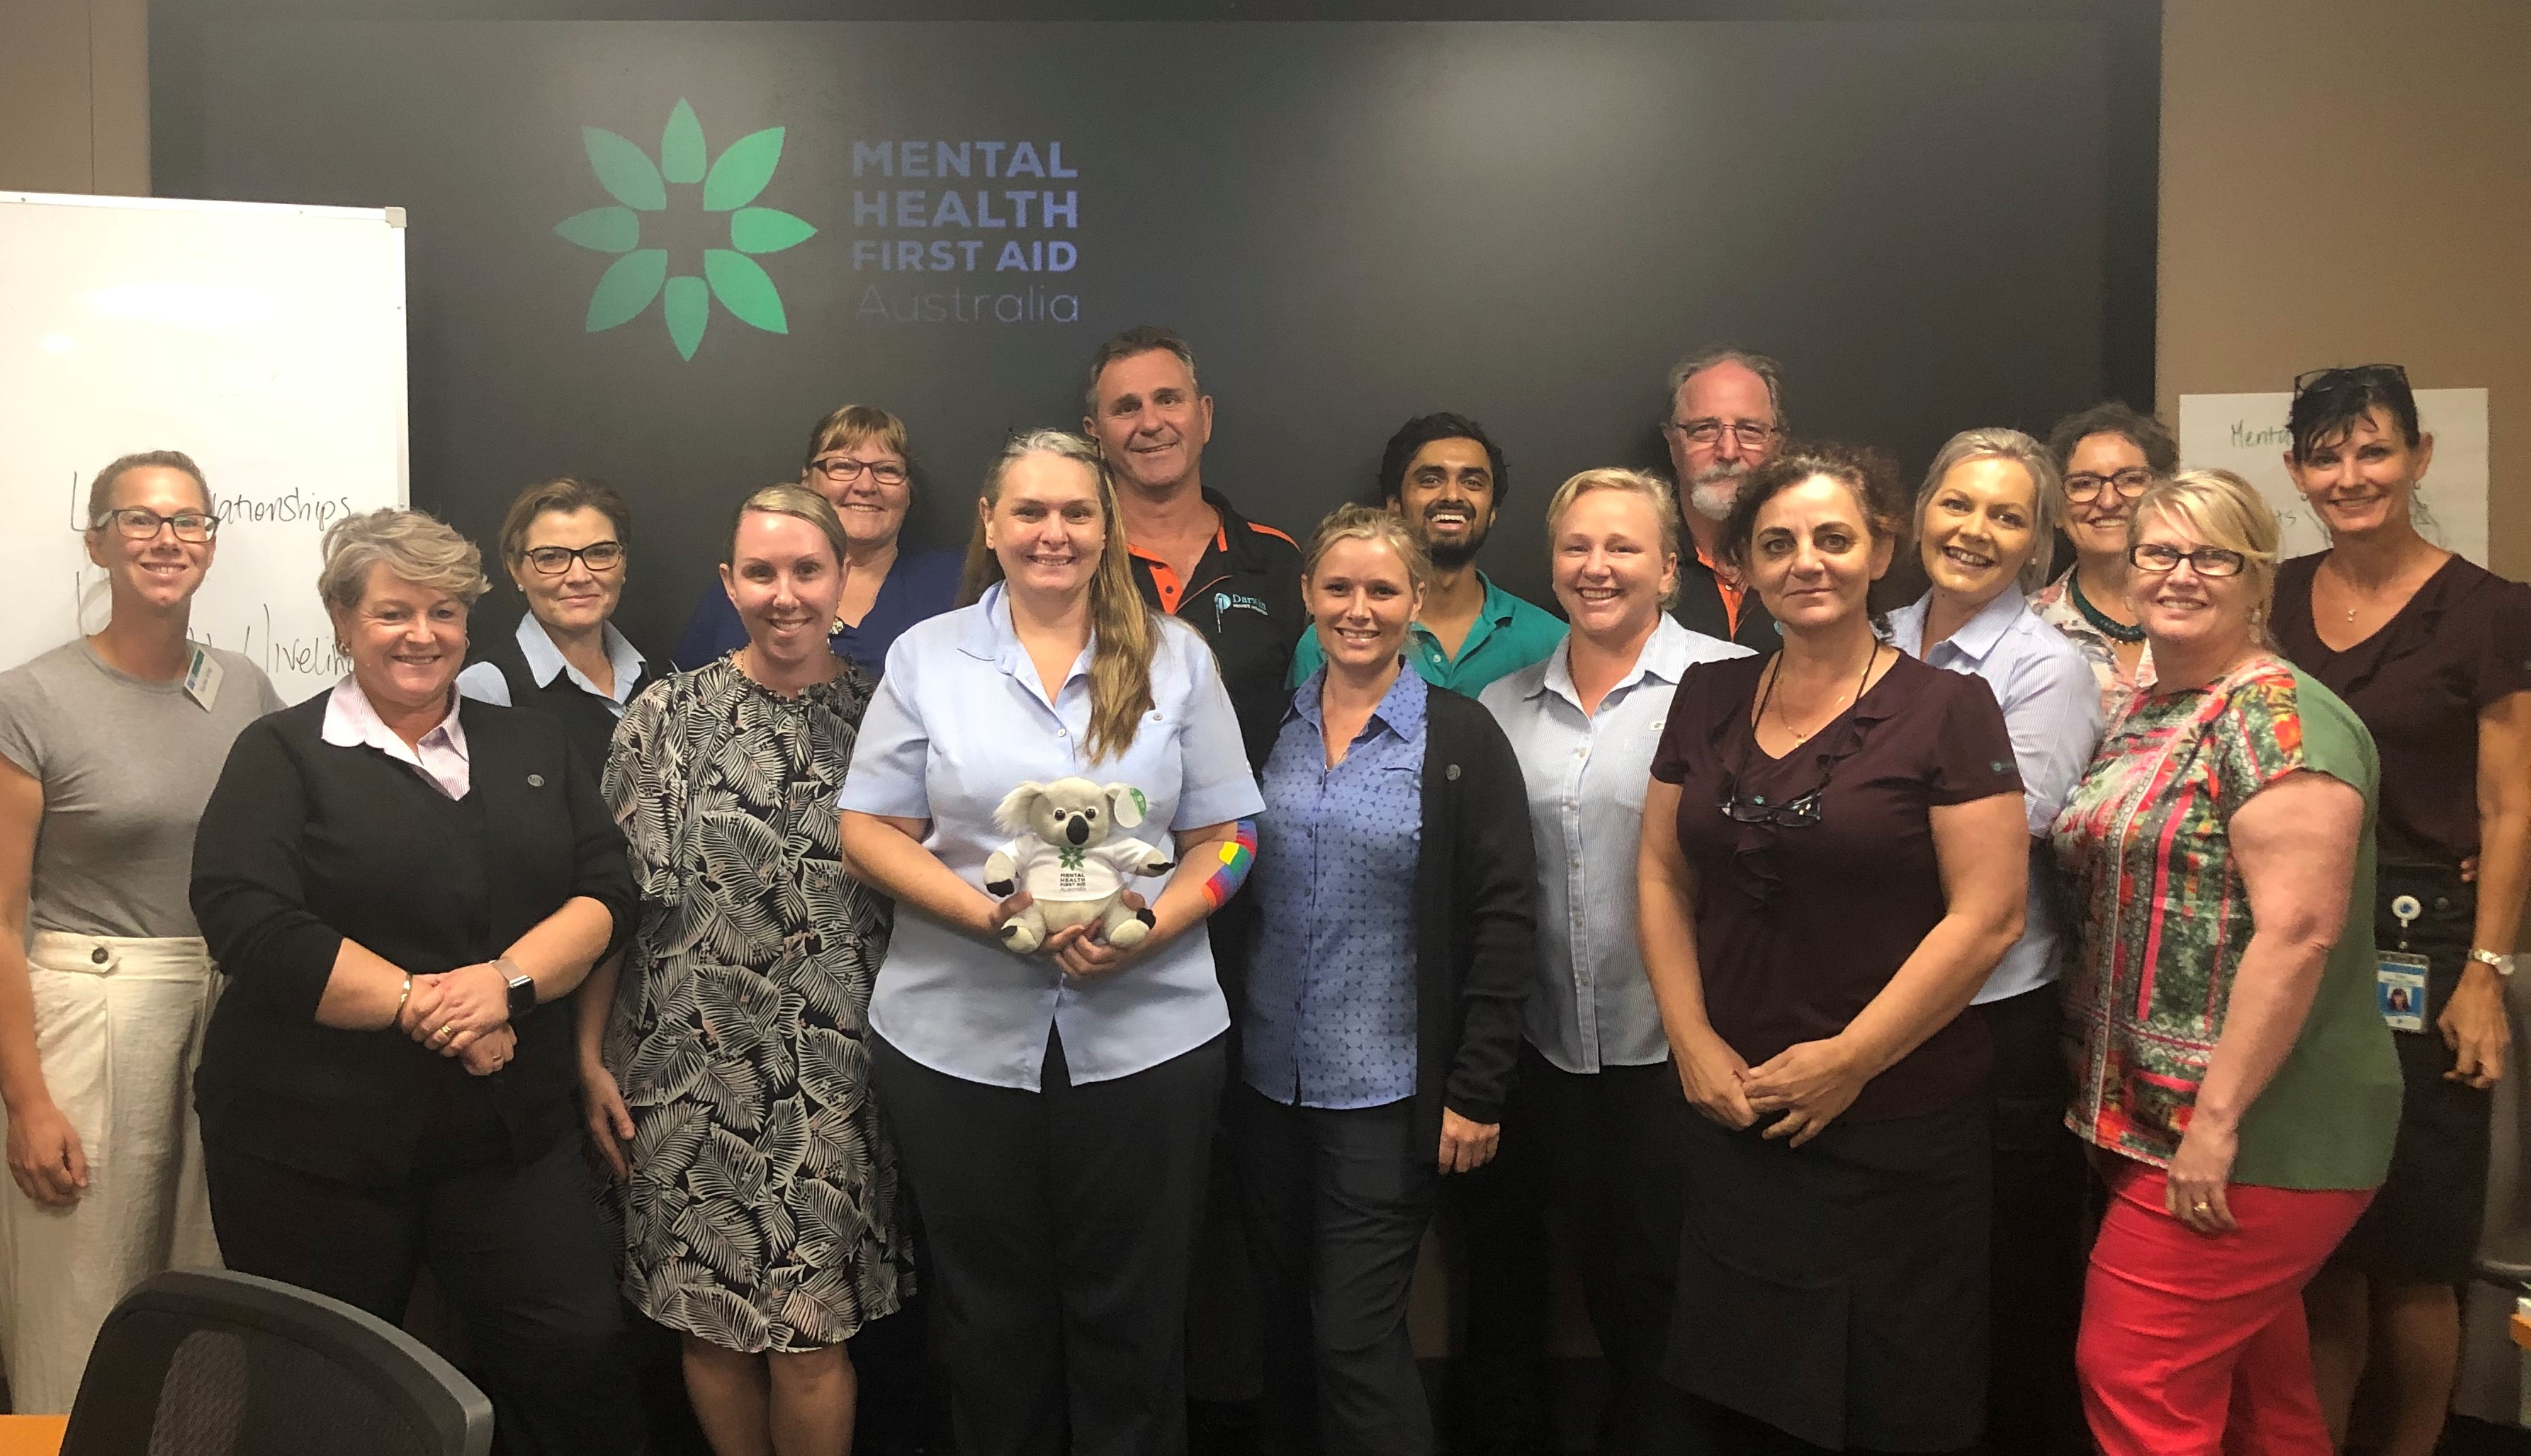 Mental Health Fist Aid at Darwin Private